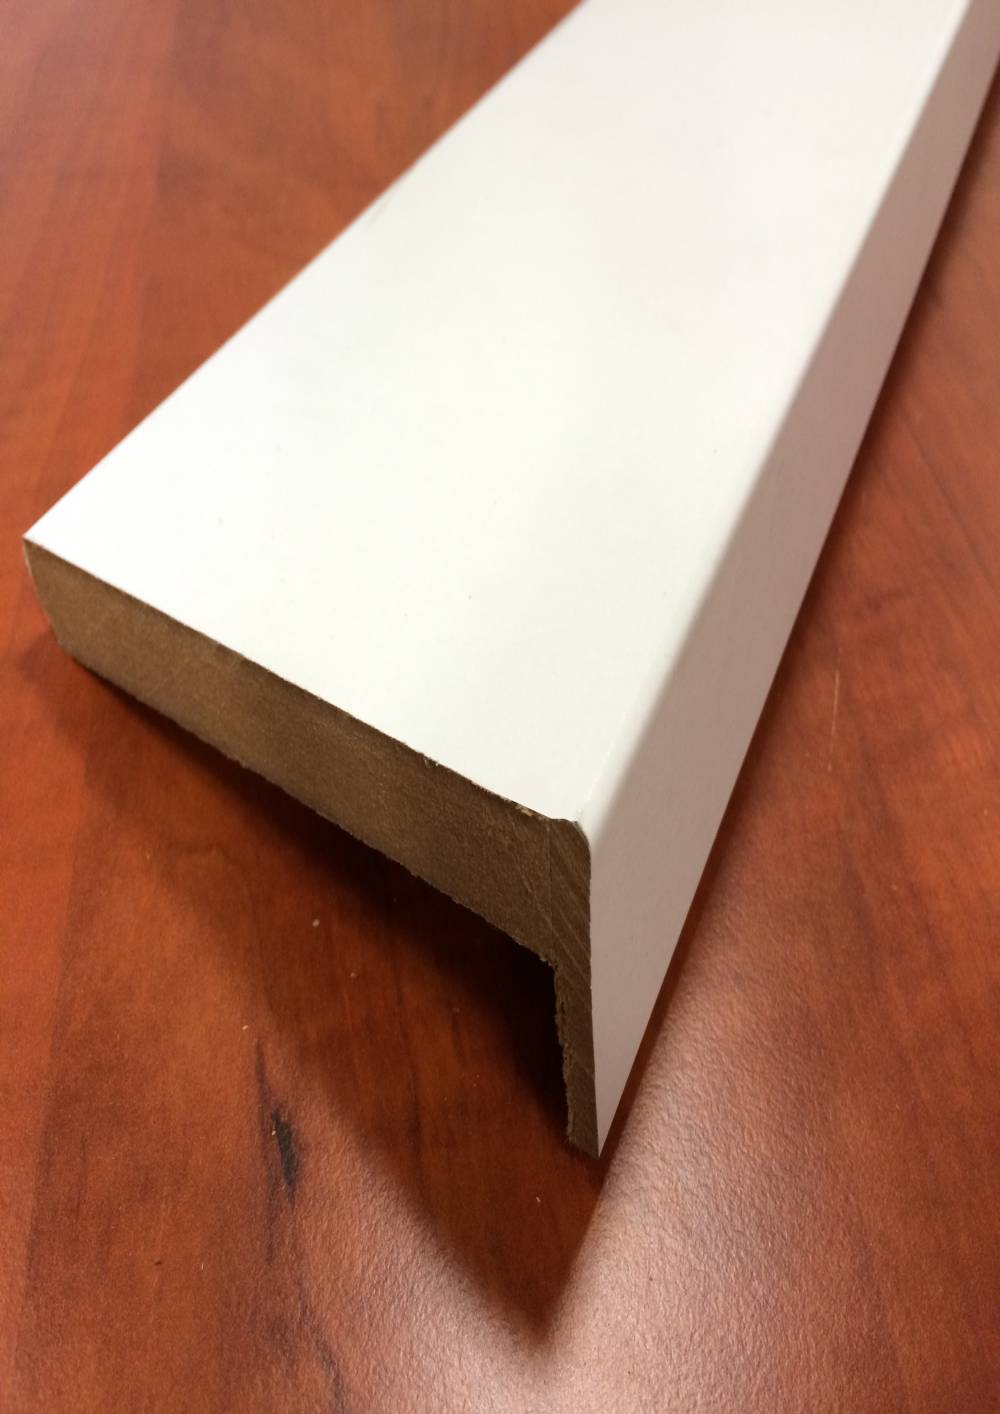 plinthe de r novation blanche support mdf profil carr 25x98x2400 mm 100 bois. Black Bedroom Furniture Sets. Home Design Ideas